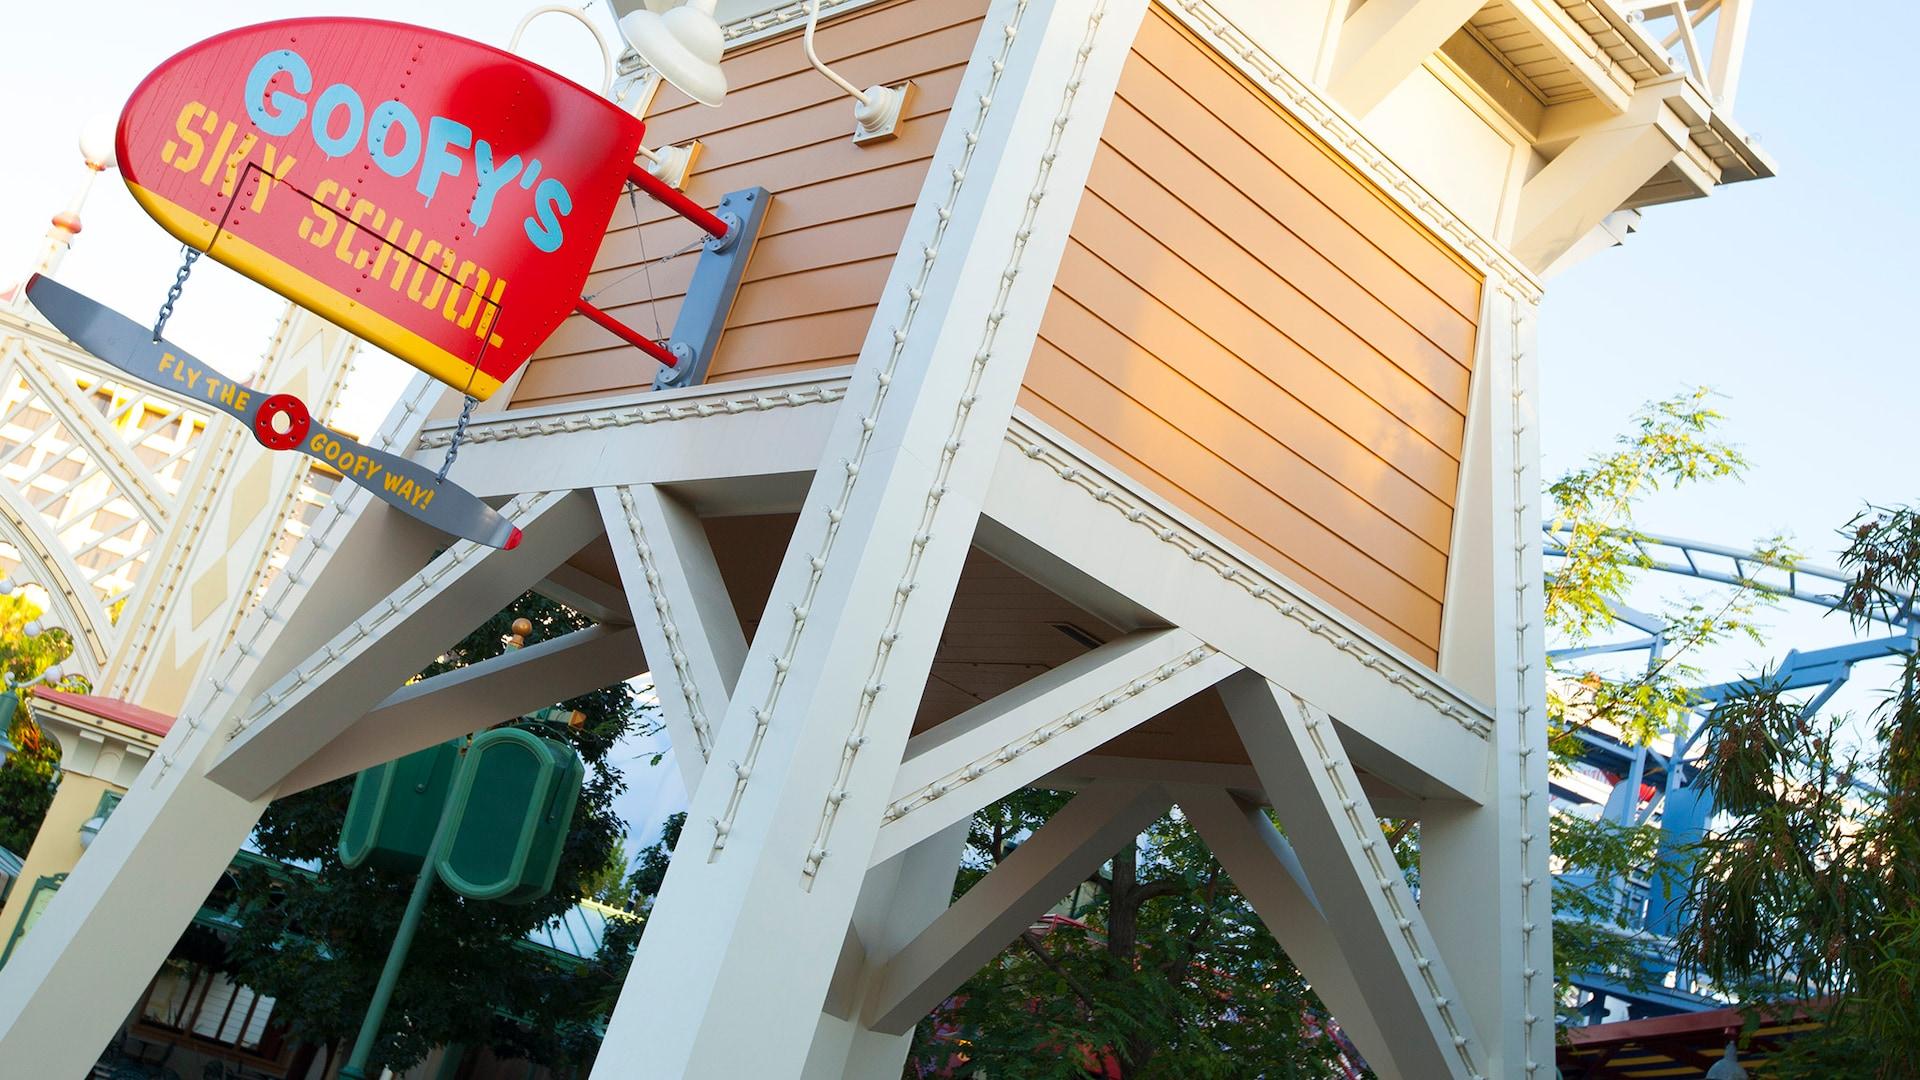 Goofy S Sky School Rides Attractions Disney California Adventure Park Disneyland Resort